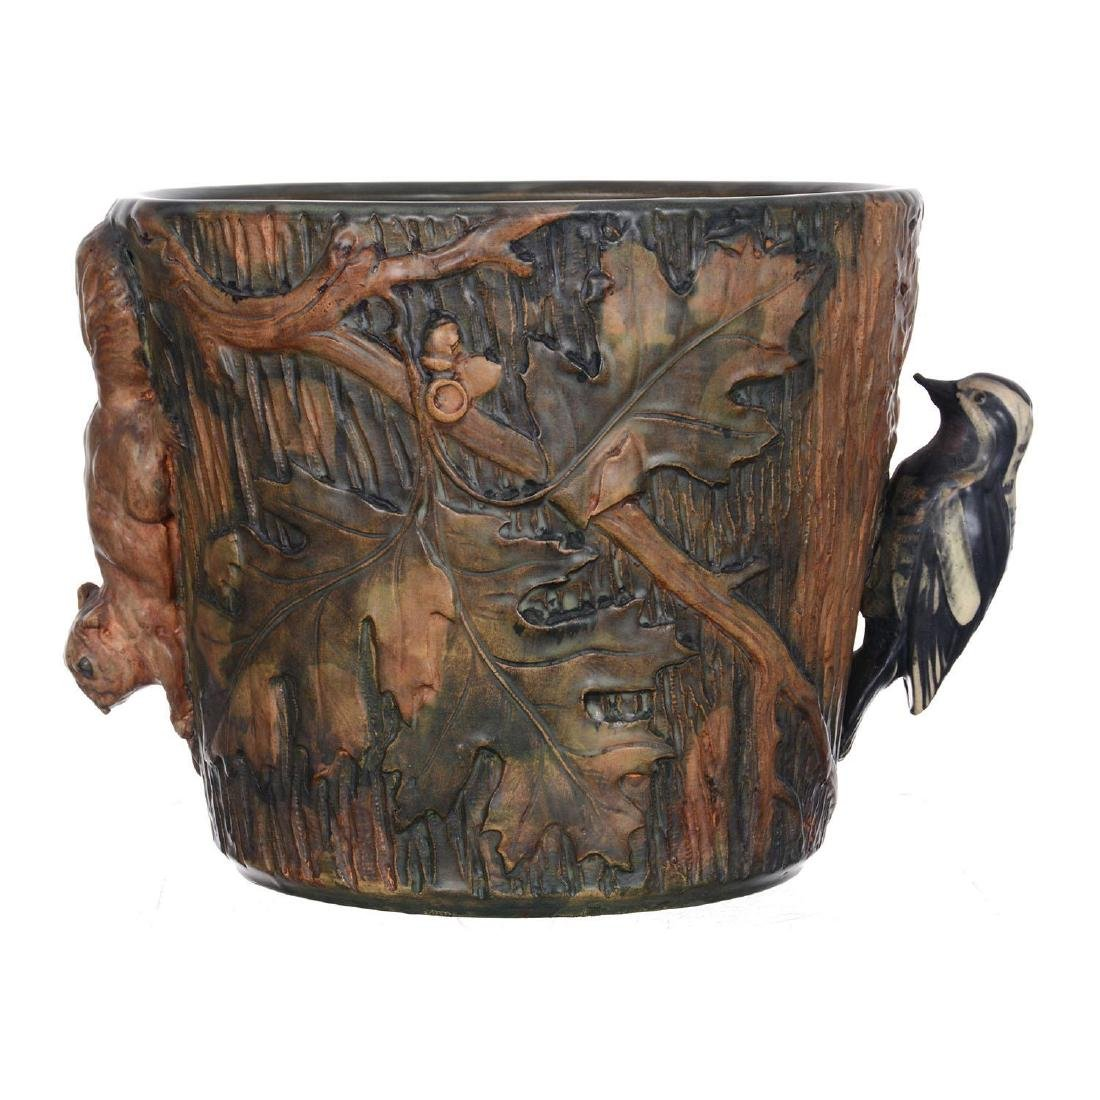 "9.5"" X 11"" Marked Weller Art Pottery Jardiniere"